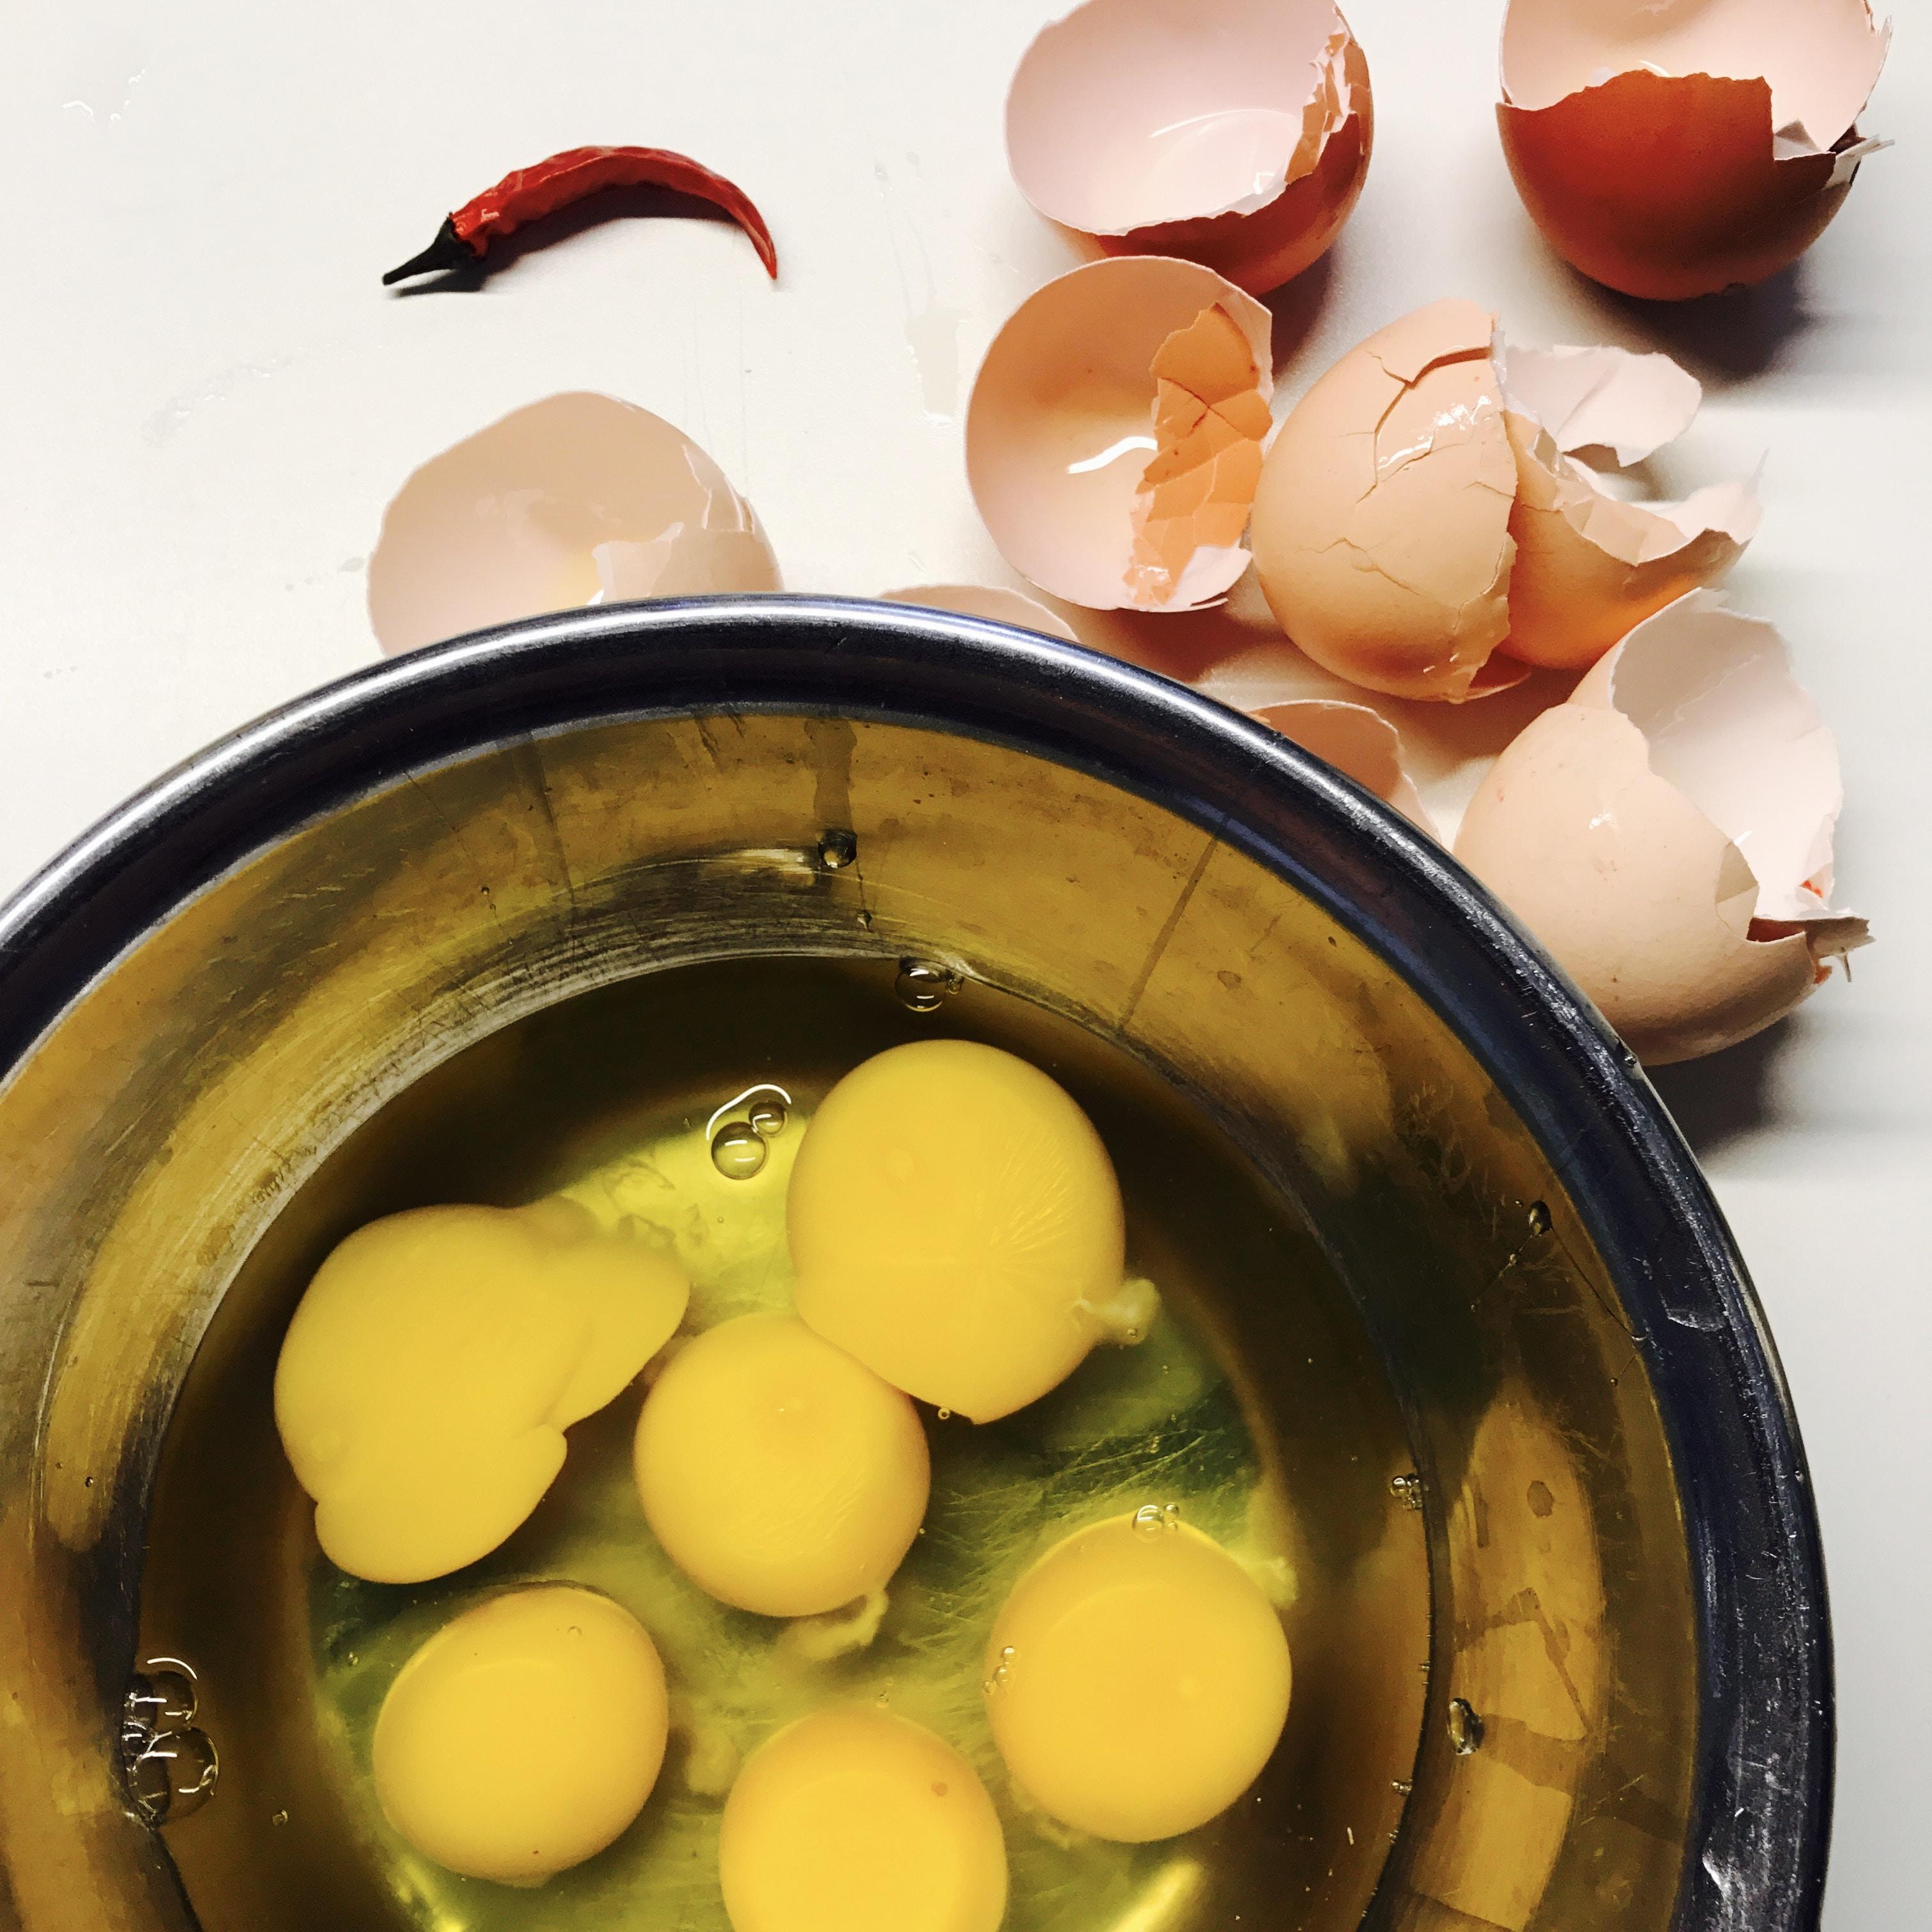 cracked eggs beside round blue bowl